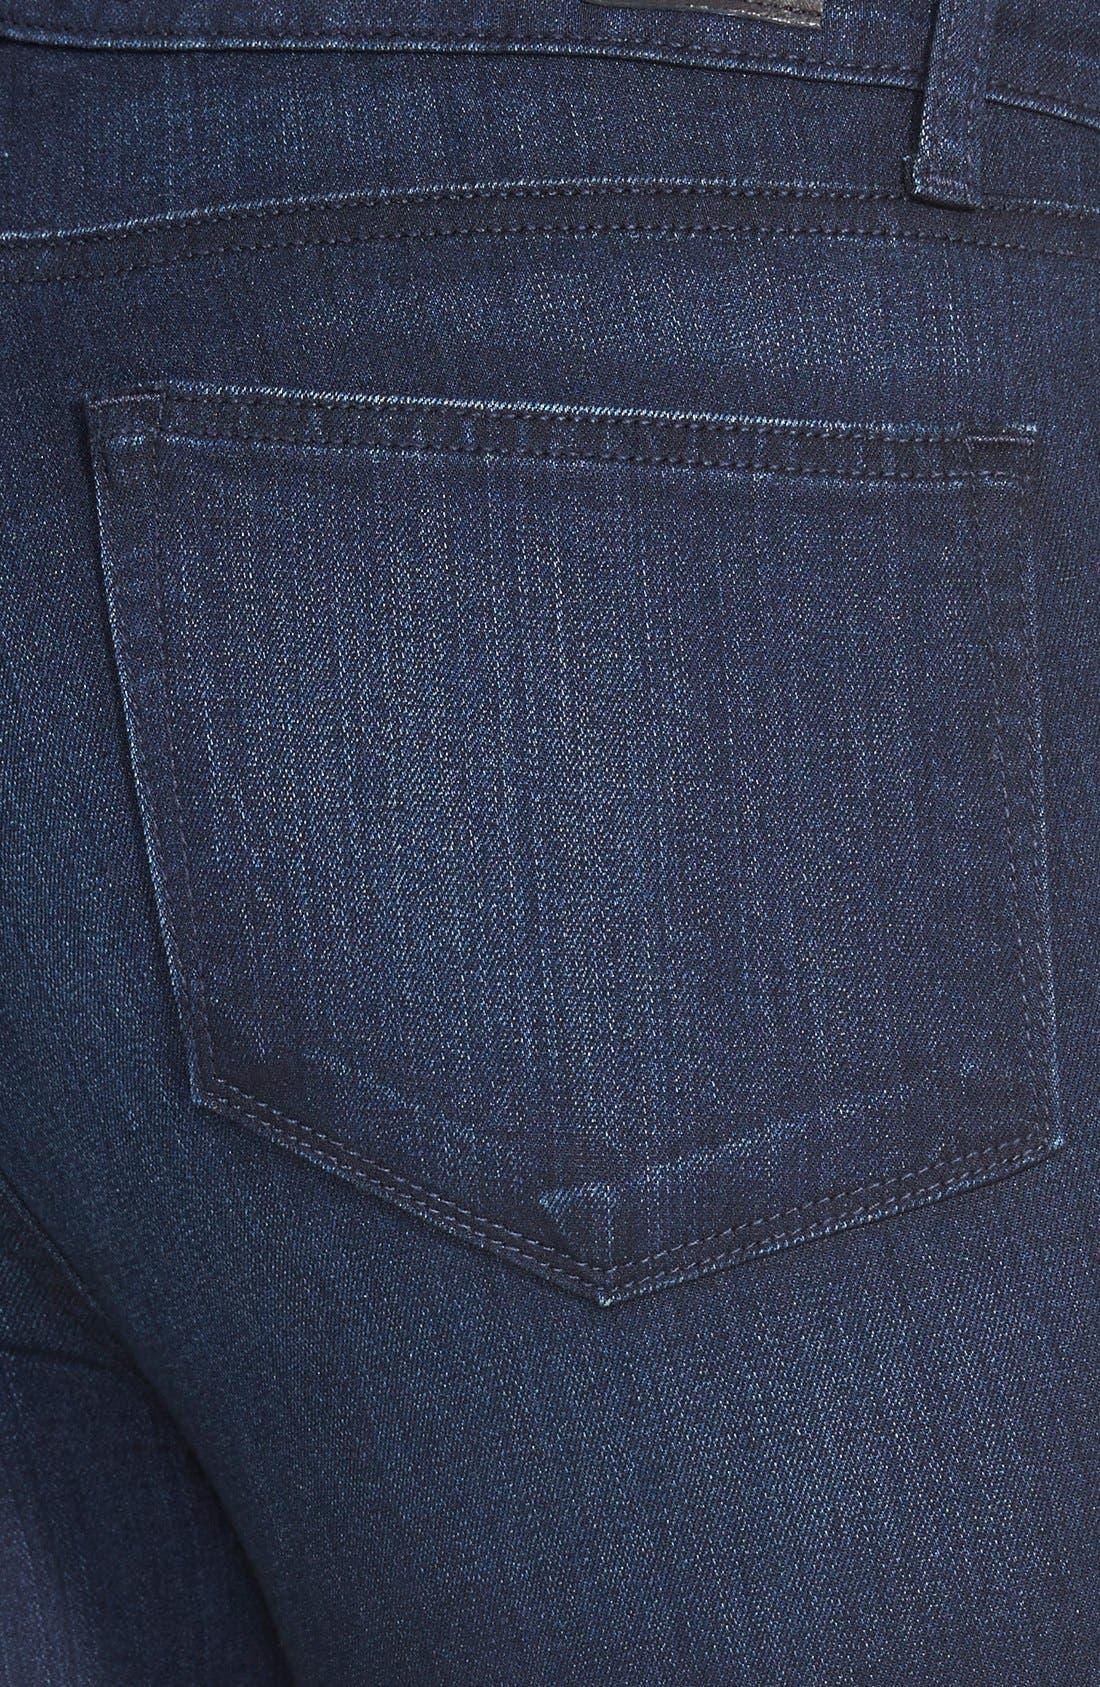 Denim 'Transcend - Hoxton' High Rise Ultra Skinny Jeans,                             Alternate thumbnail 3, color,                             Mae